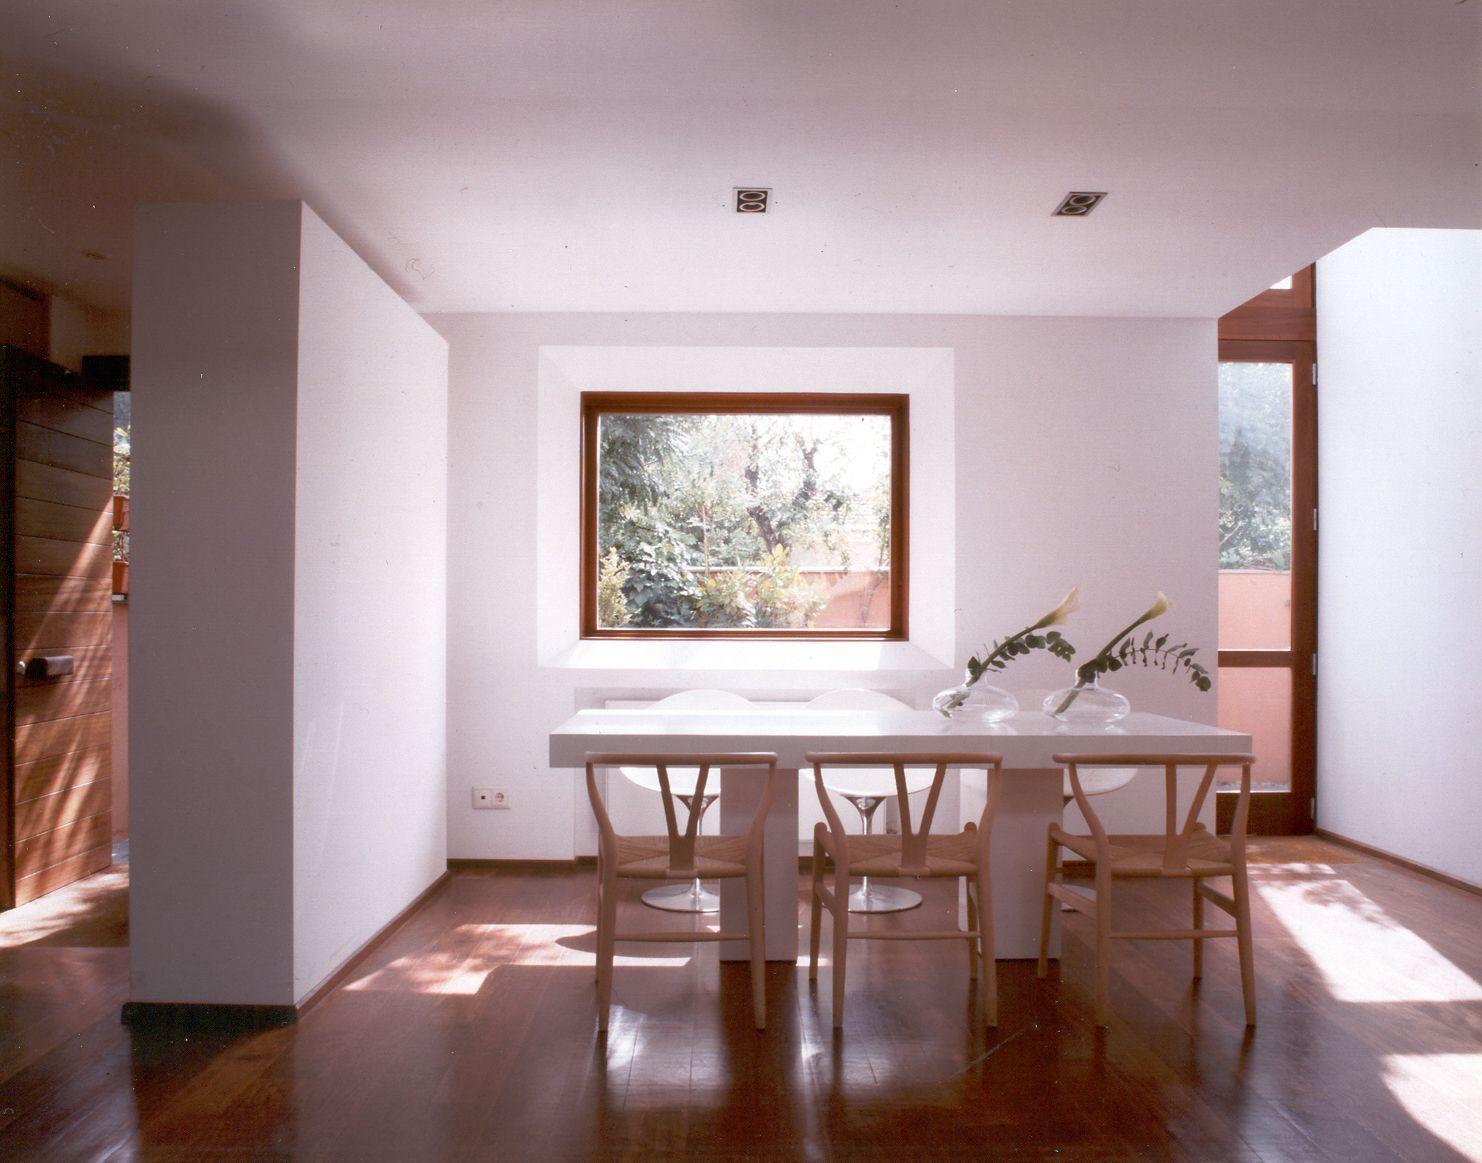 MINIMAL SPACES. SMALL HOUSES. INTERIOR DESIGN. MAJADAHONDA POZUELO BOADILLA CASAS.